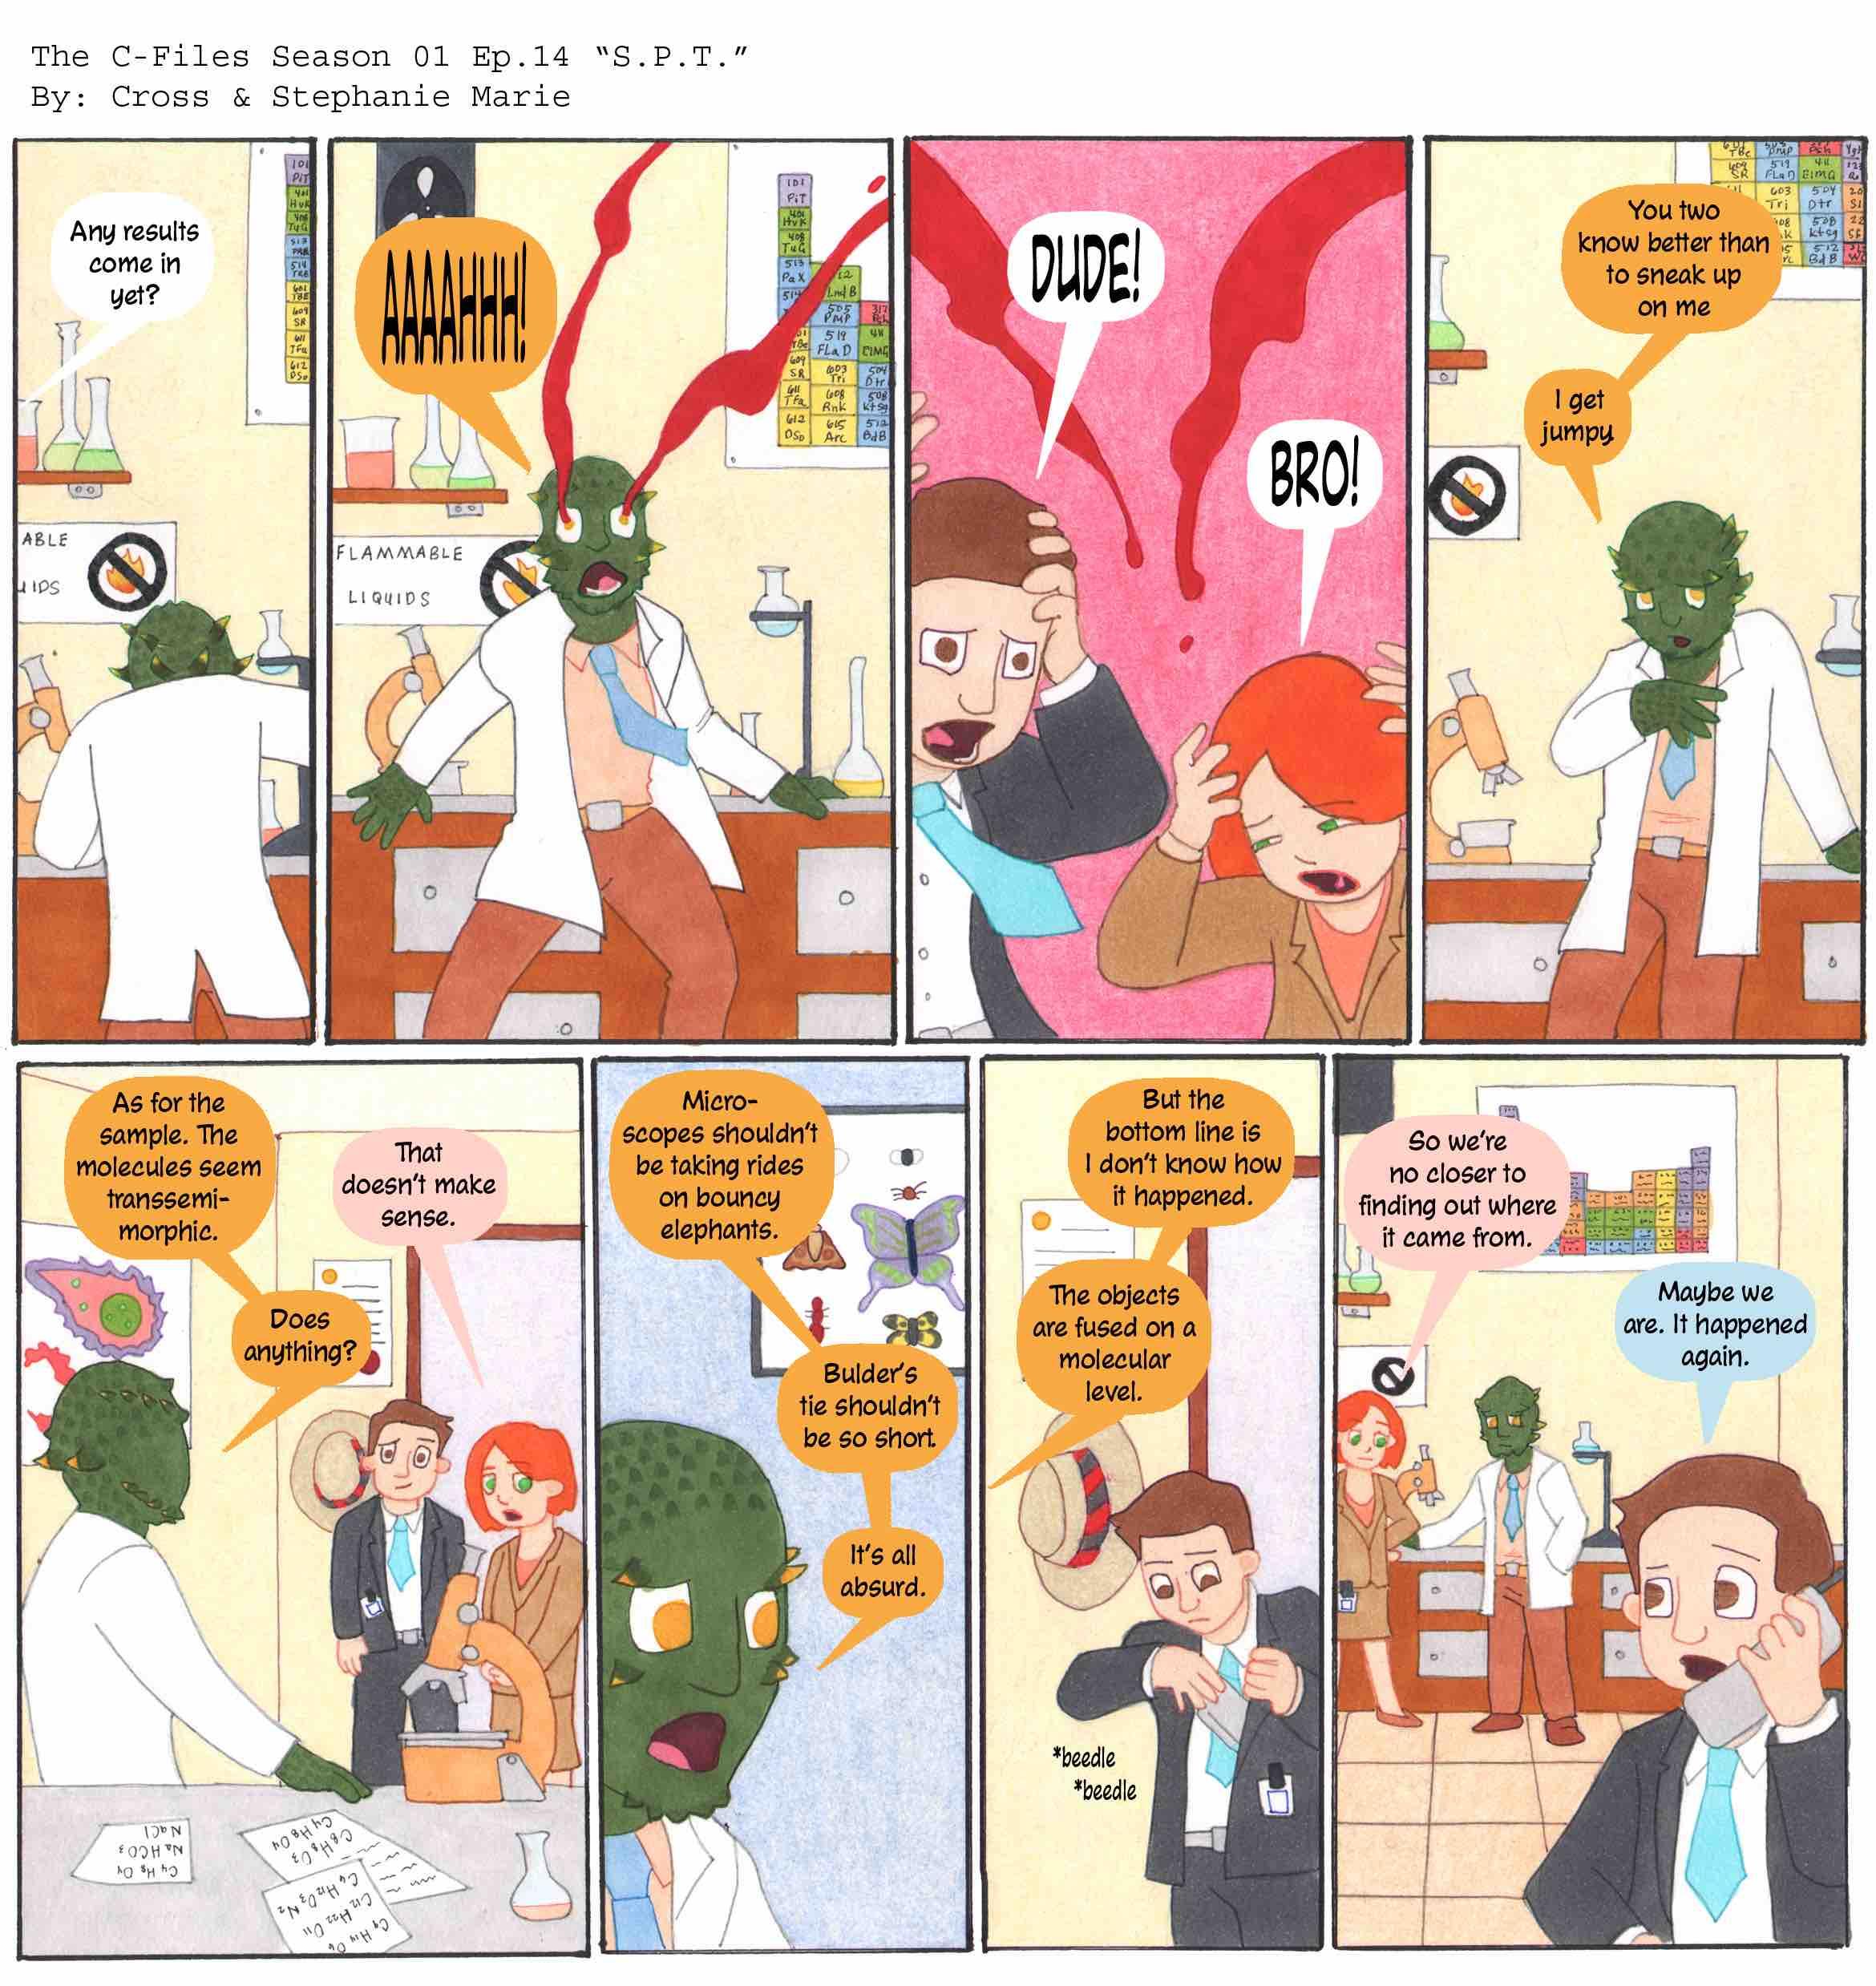 The C-Files 14